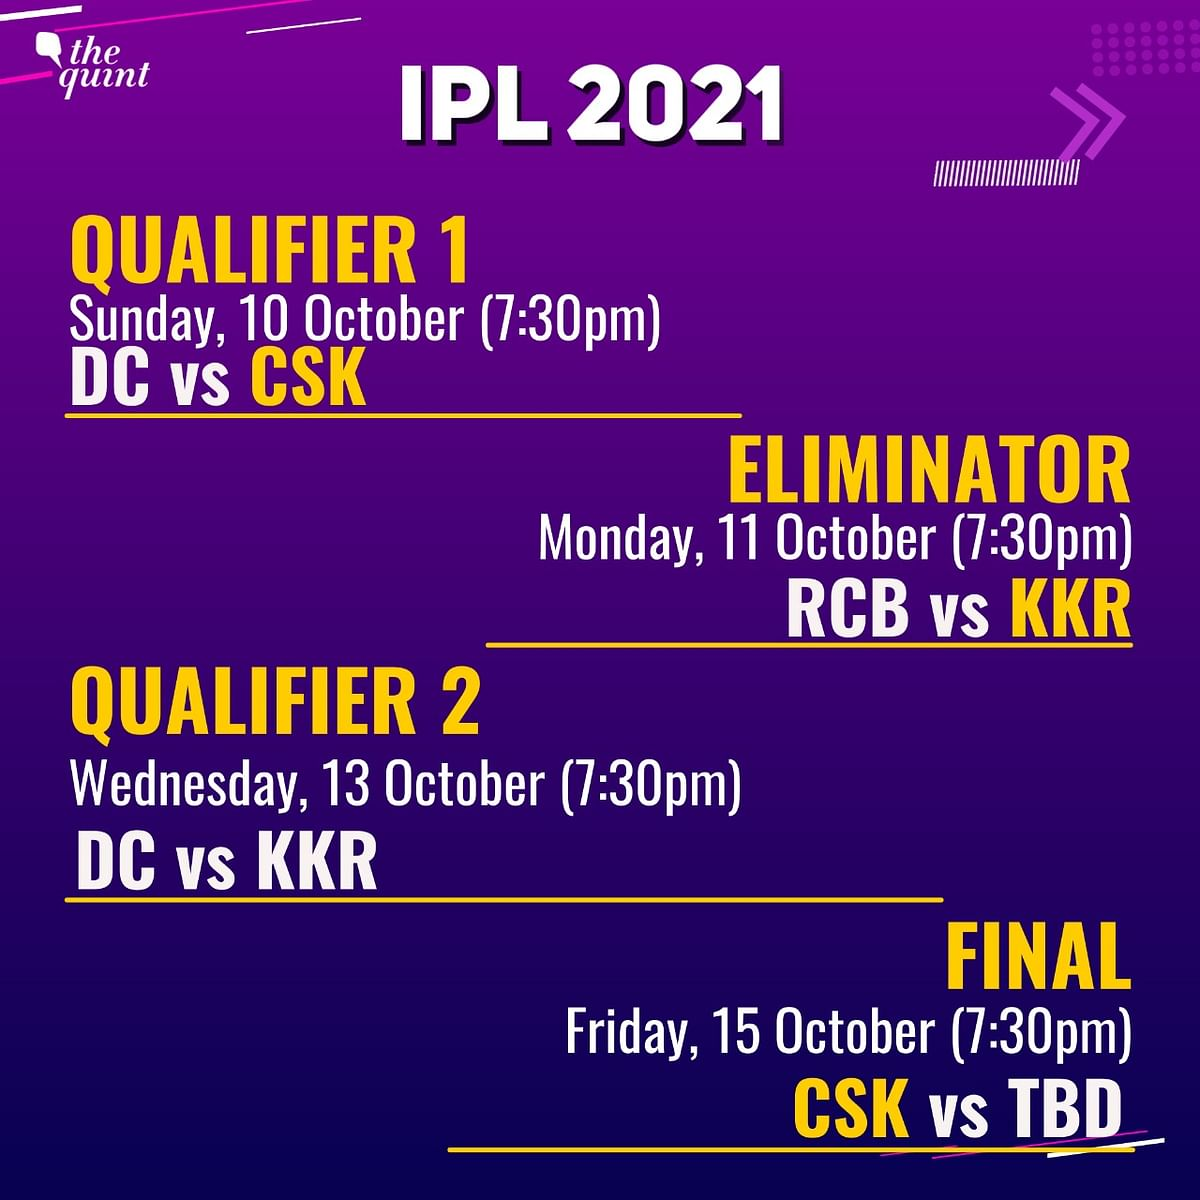 IPL Eliminator RCB vs KKR LIVE: Narine Stars as KKR Knock Virat Kohli's RCB Out